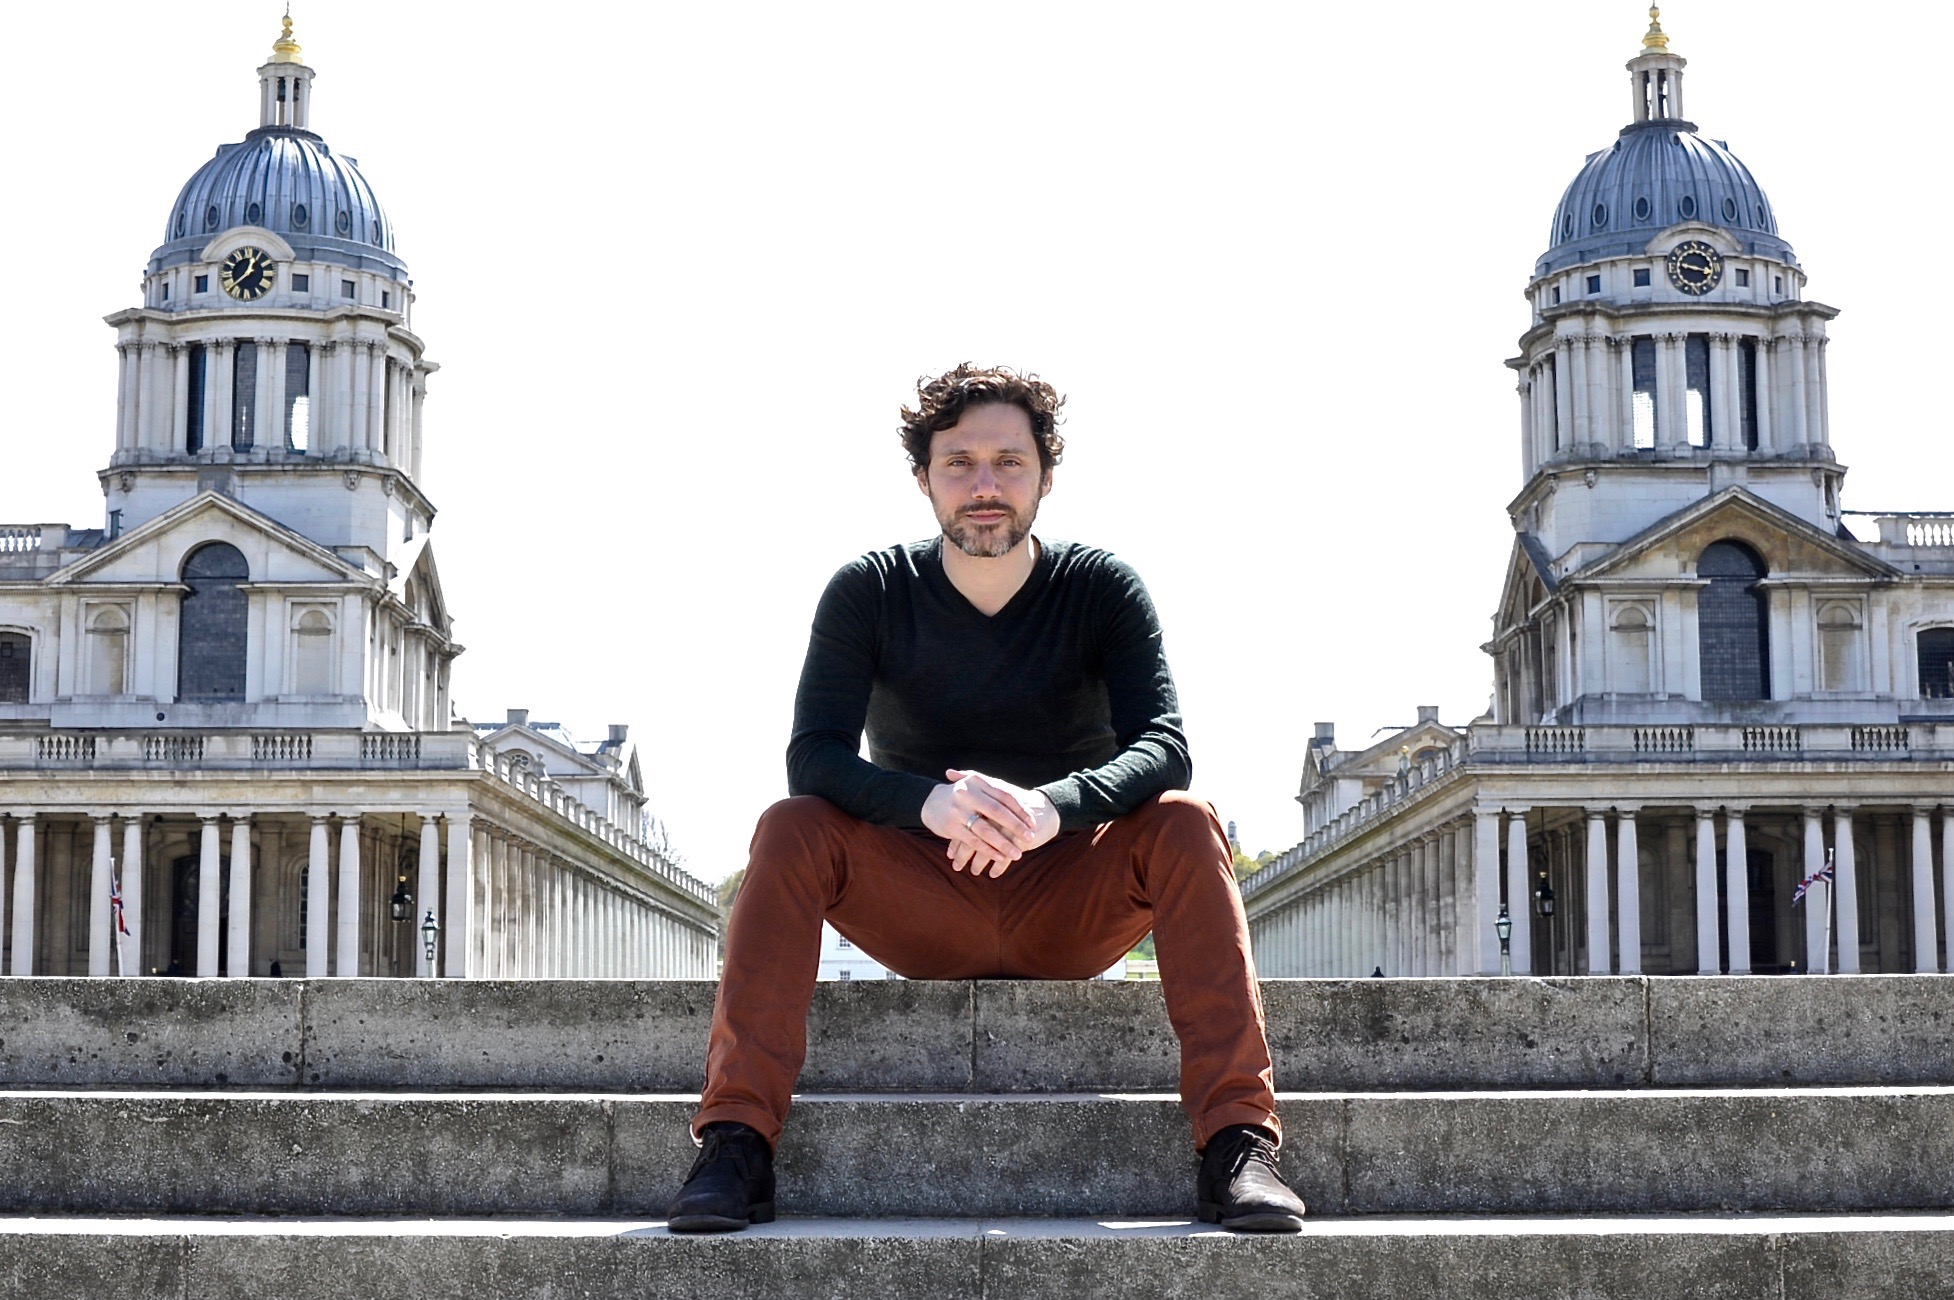 Adrien Mastrosimone, Countertenor | DEBUT at the Shoreditch Treehouse, Classical Concert Series, London.jpg